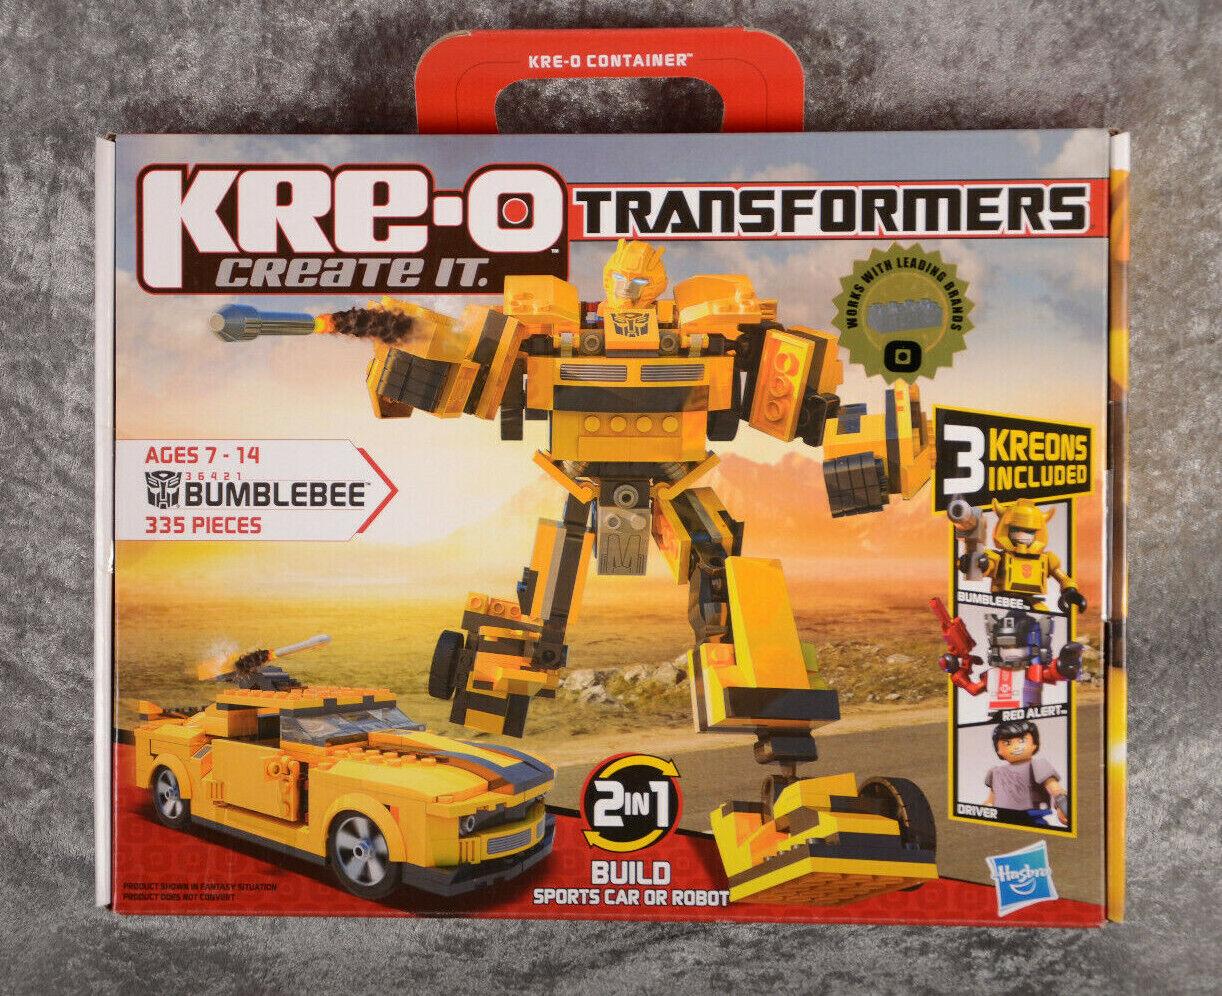 Hasbro Kre-o Transformers BUMBLEBEE BUMBLEBEE BUMBLEBEE Construction Set  36421 335 Pieces NEW e2919b